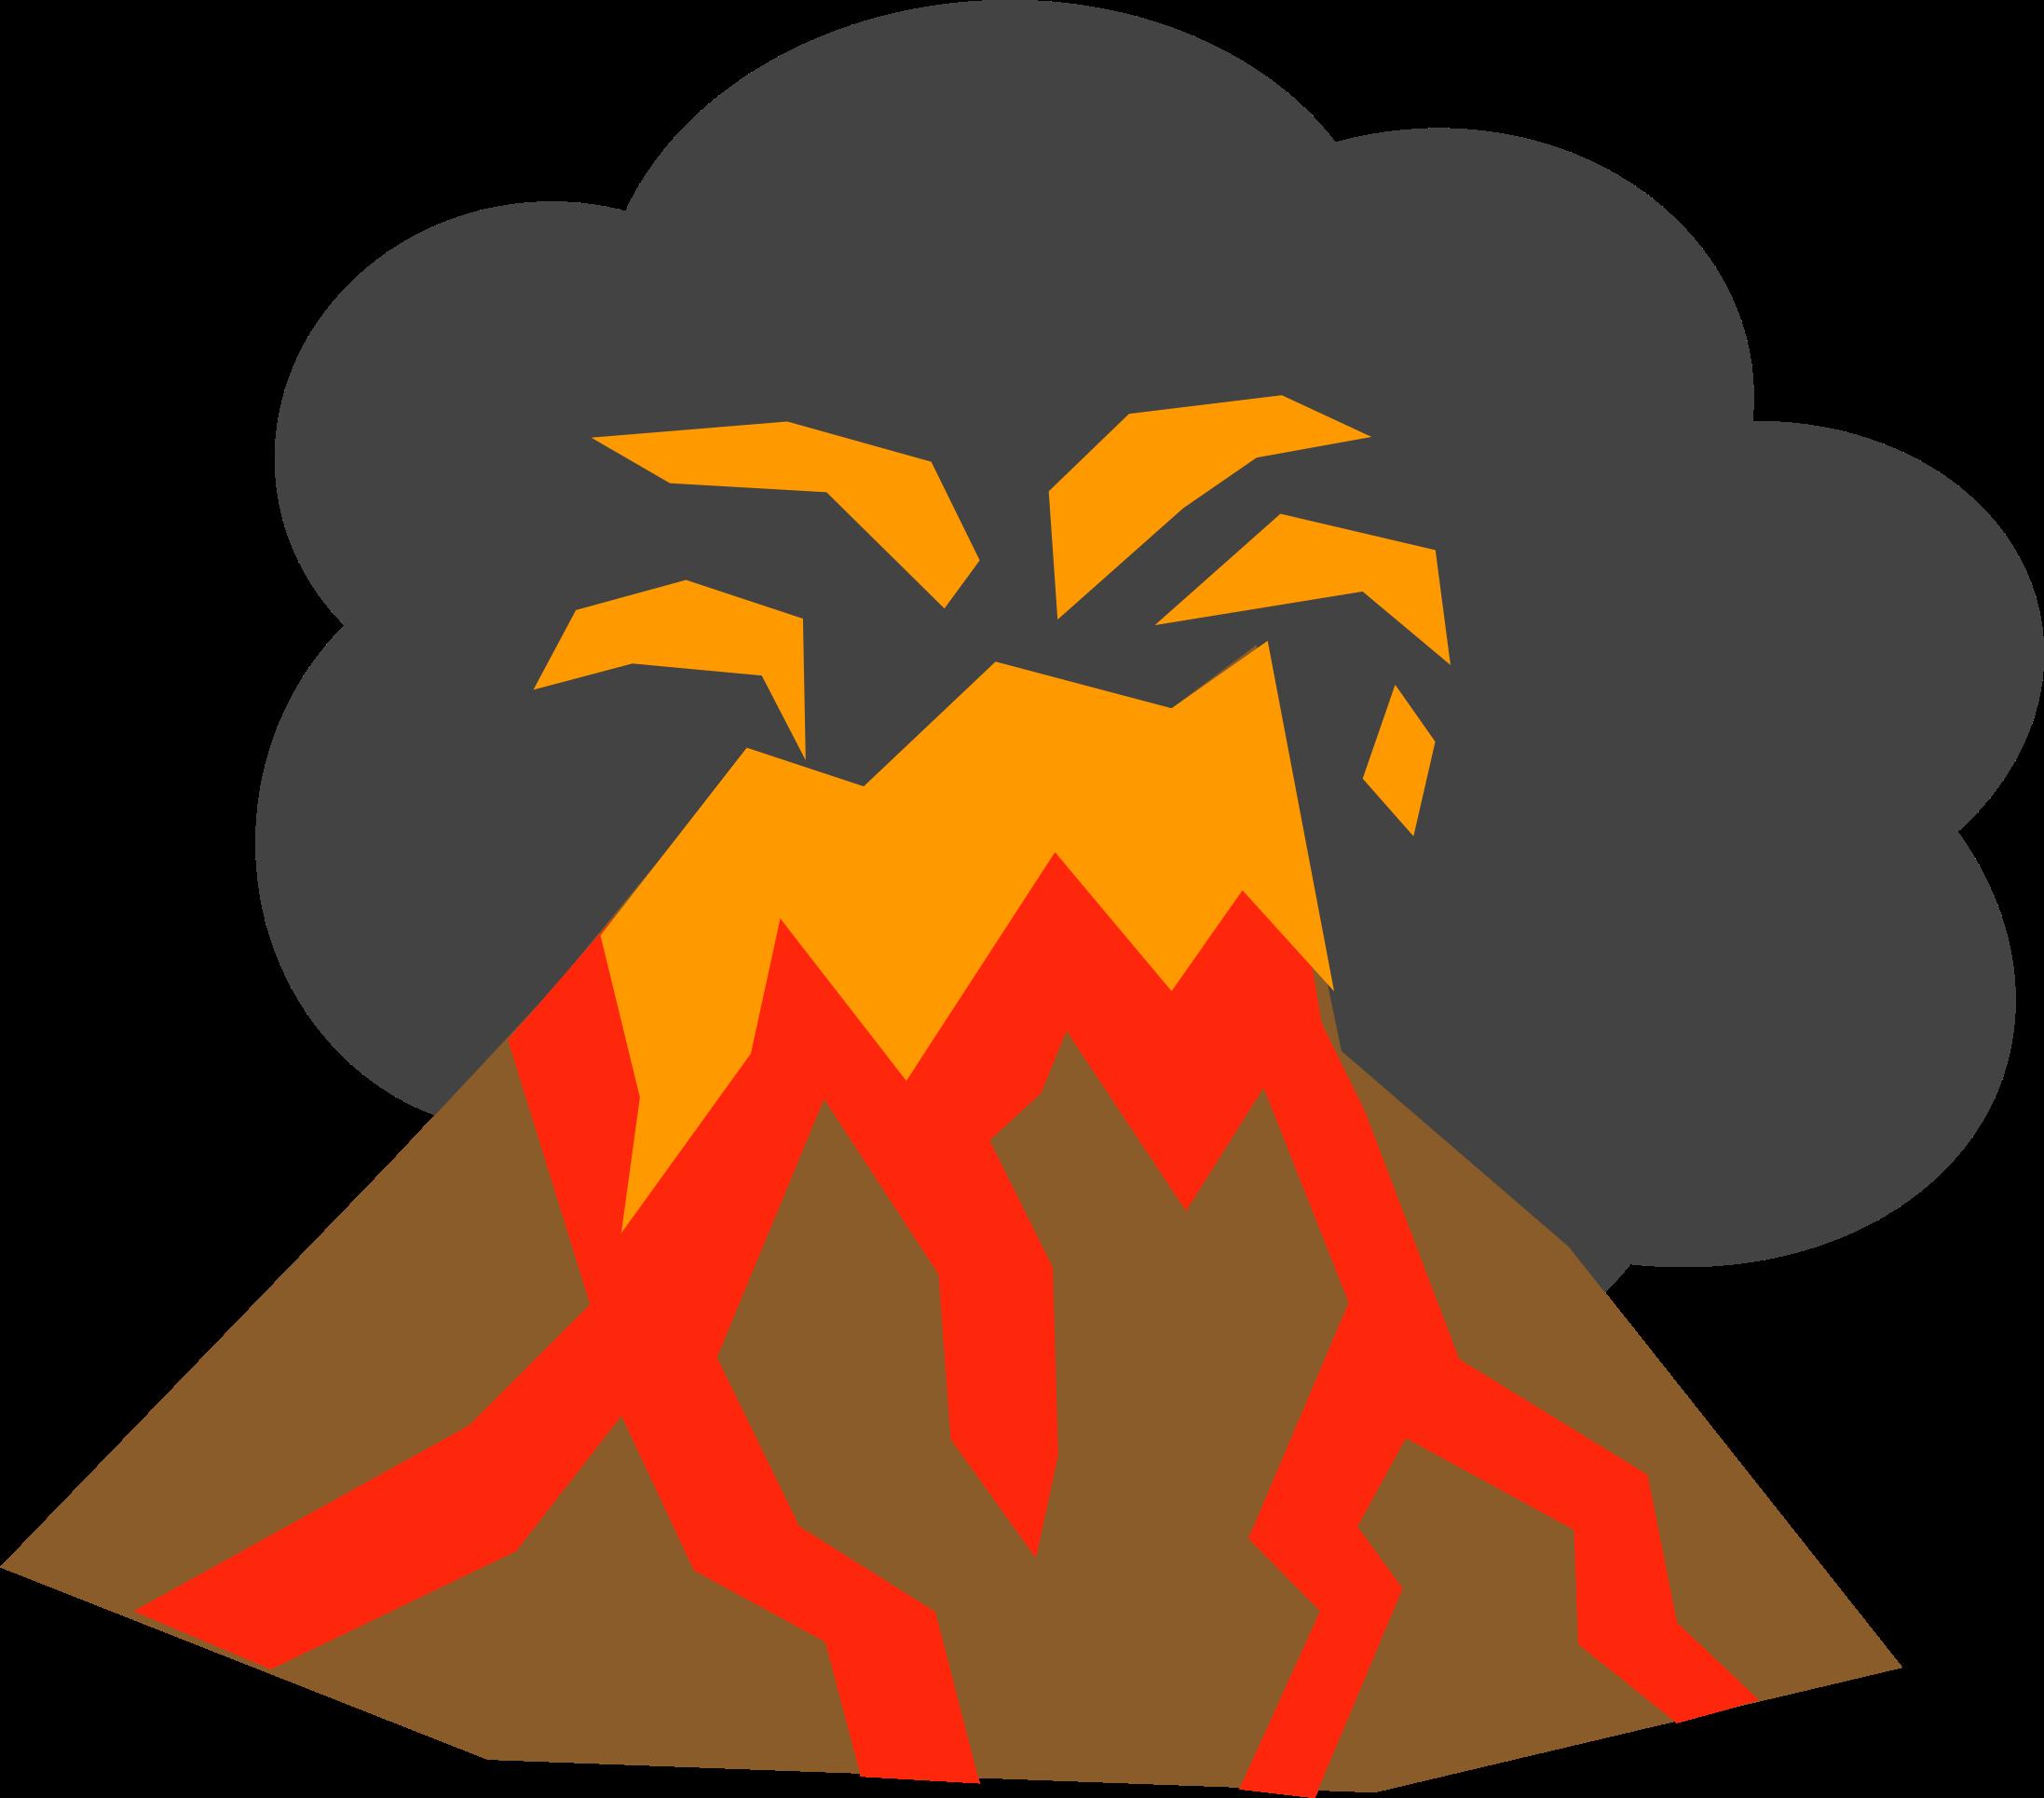 banner transparent Volcano clipart. Big image png